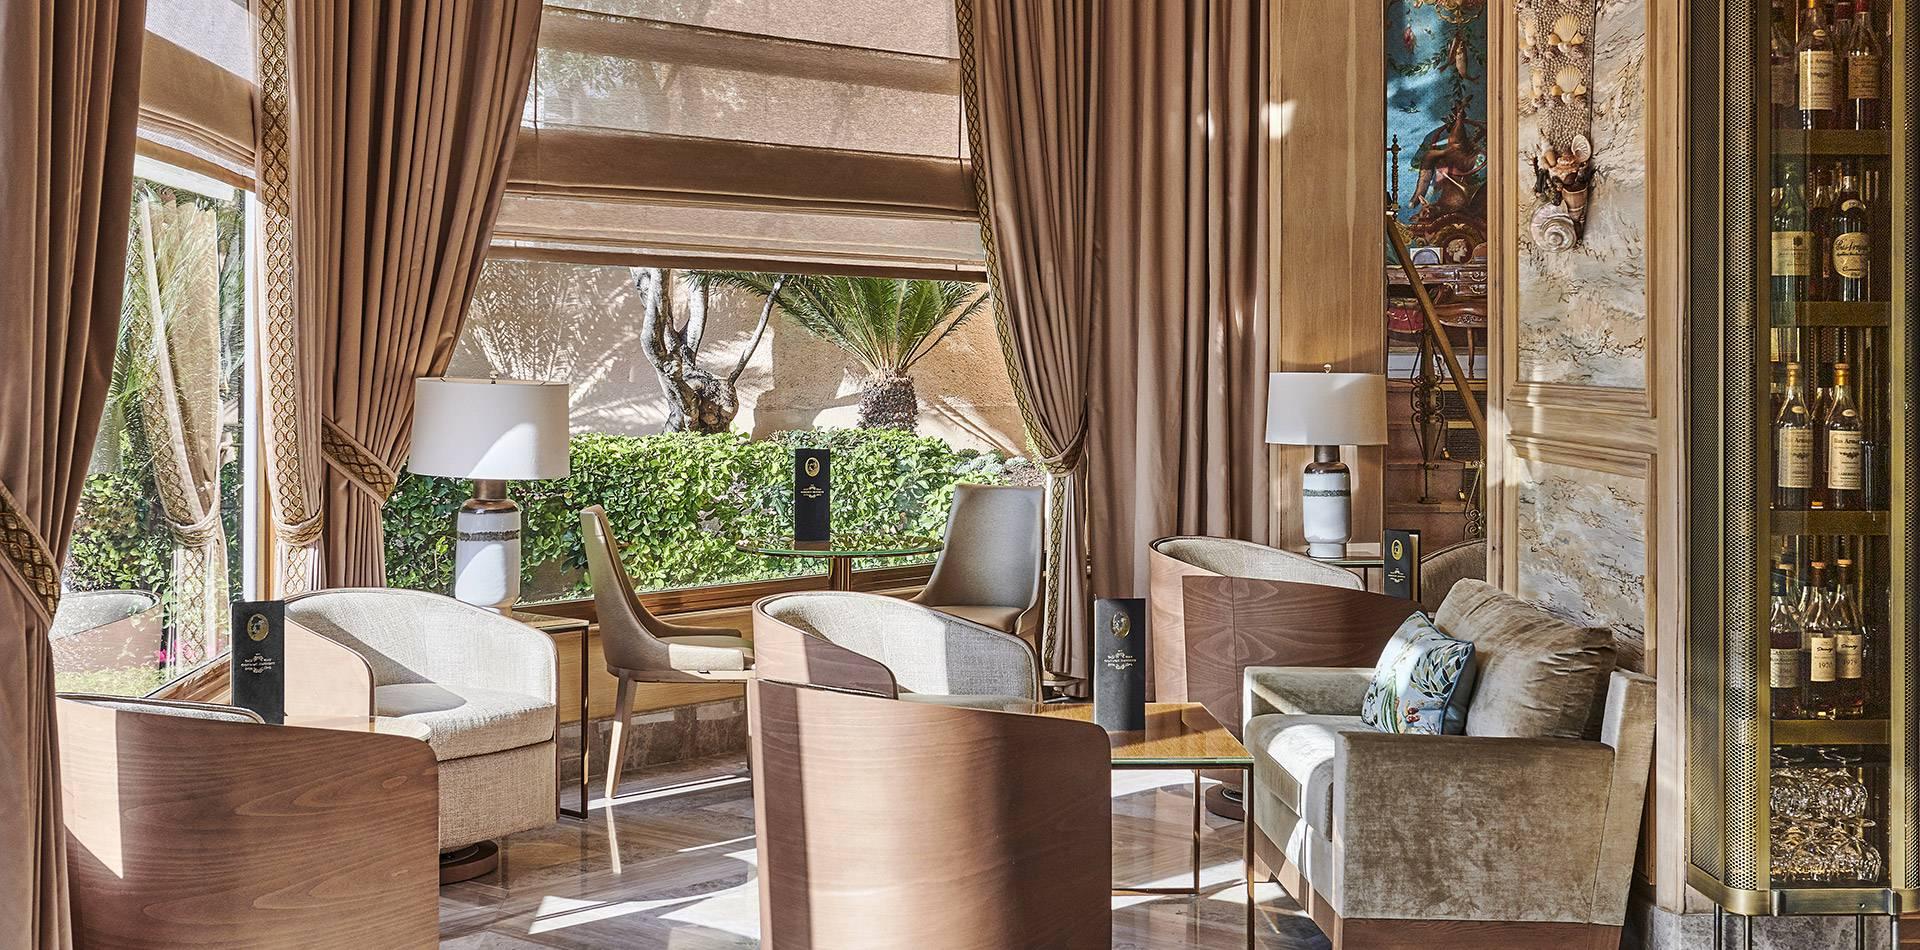 Die Bar Gordon Bennett   Luxusbar An Der Côte D'Azur encequiconcerne Salon De Jardin Bennett